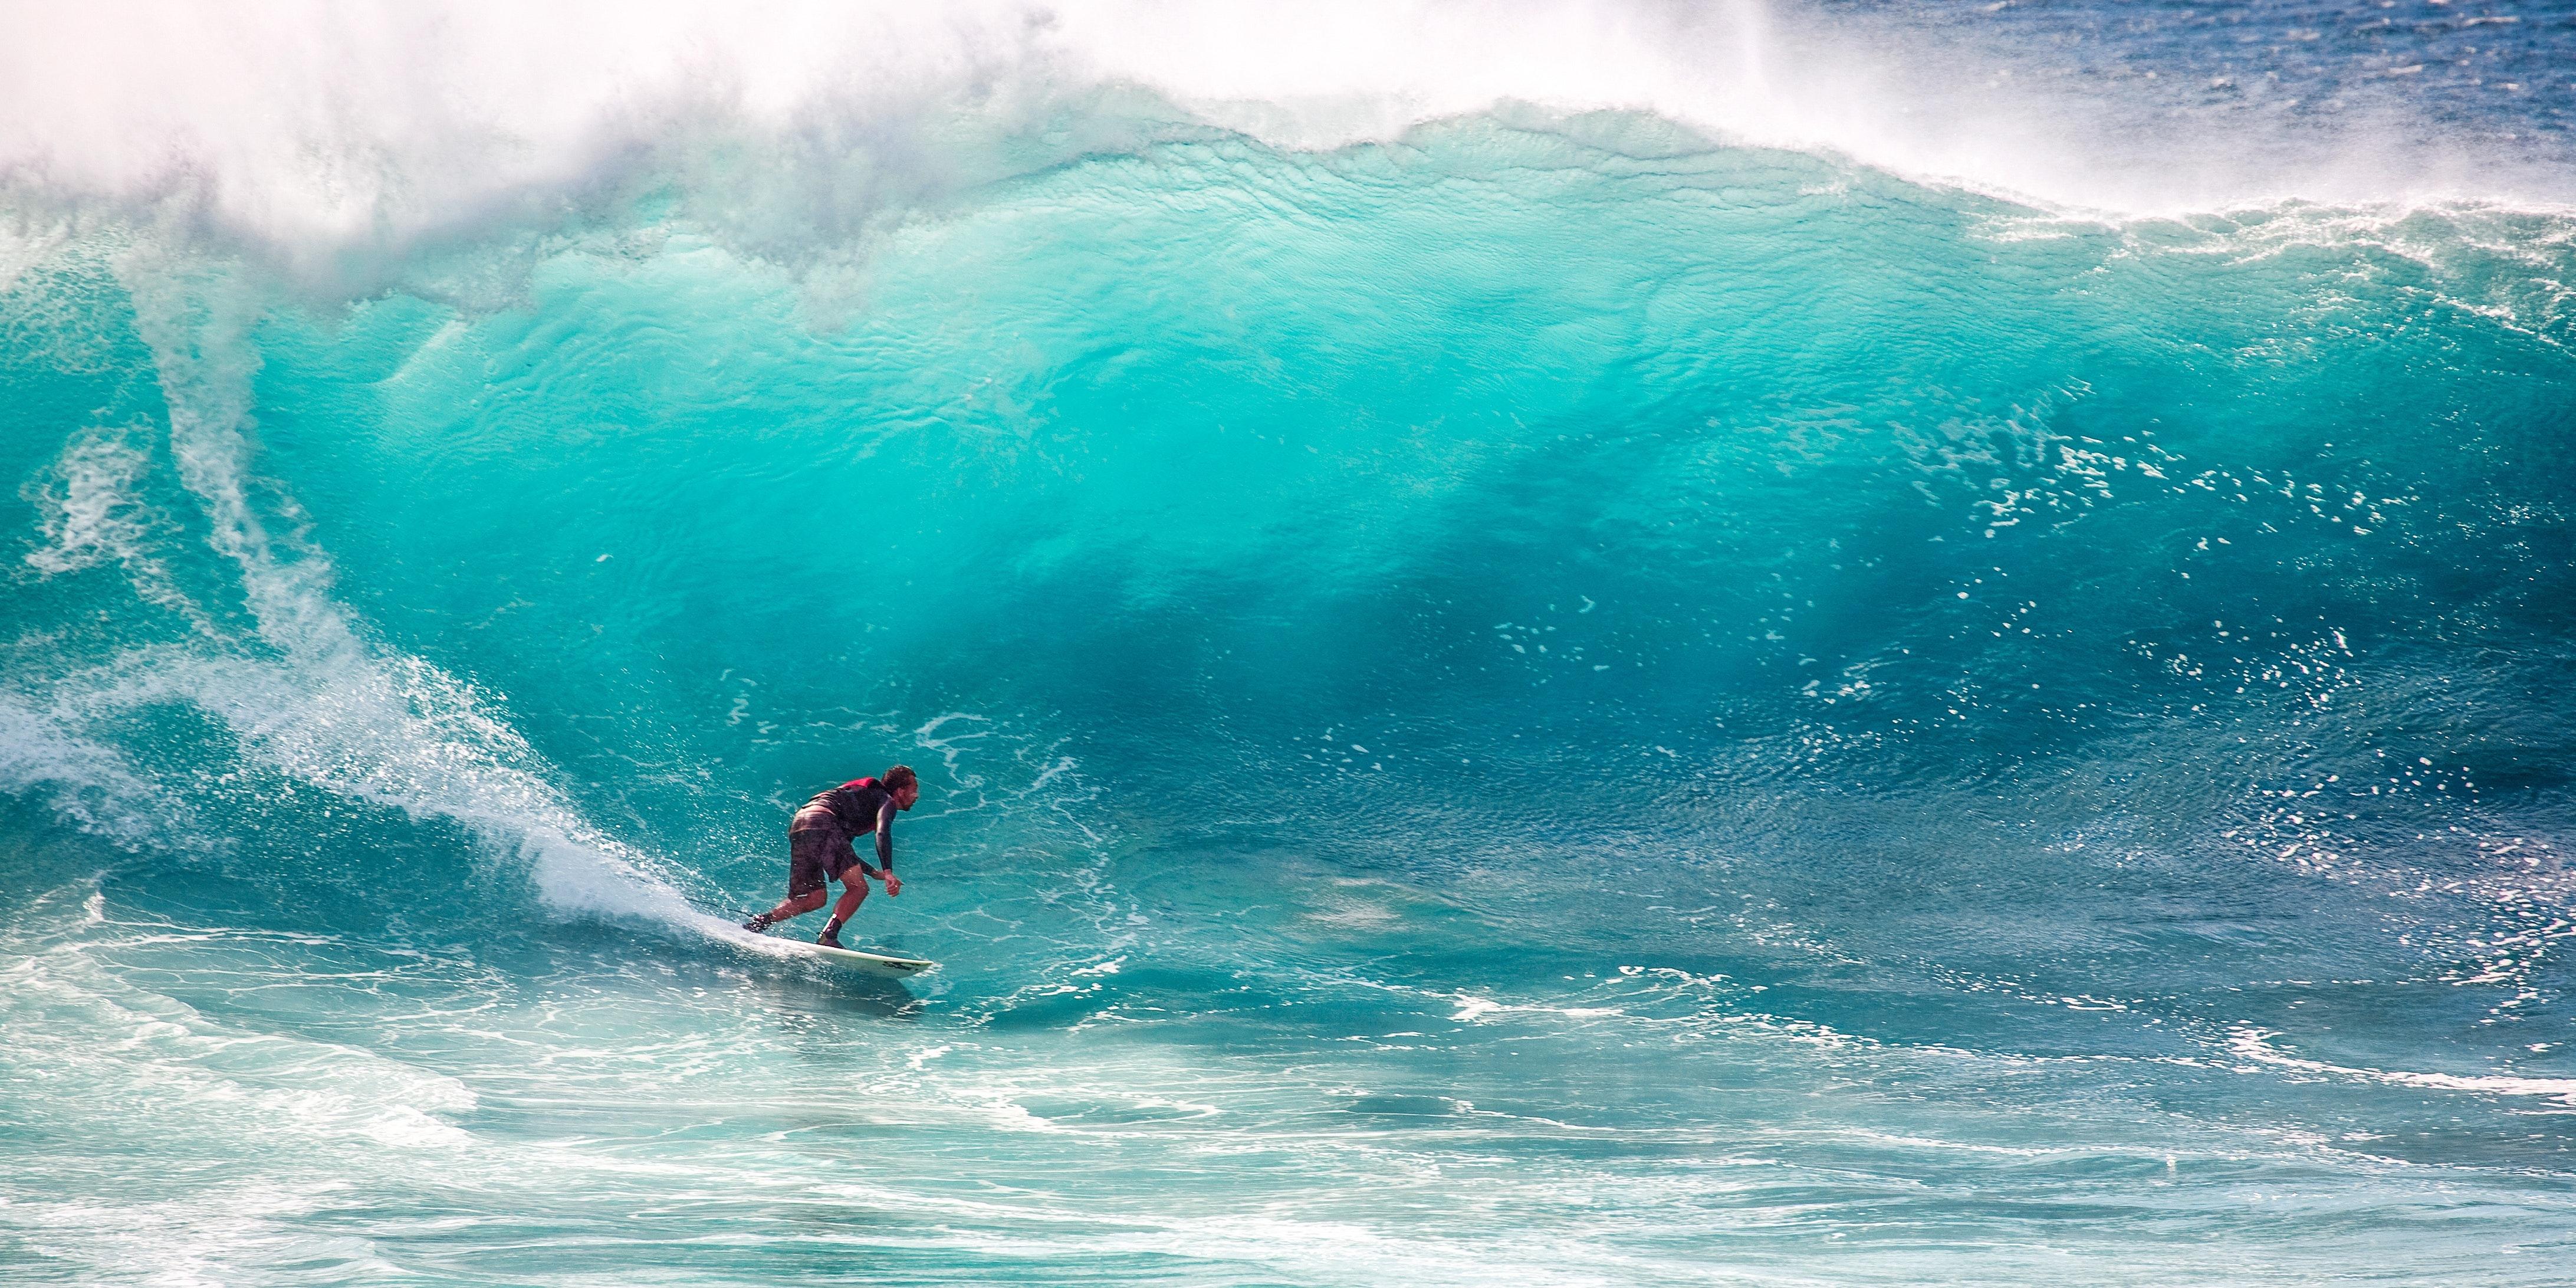 Surfanje - Page 3 Pexels-photo-416676.jpeg?cs=srgb&dl=sea-person-beach-416676